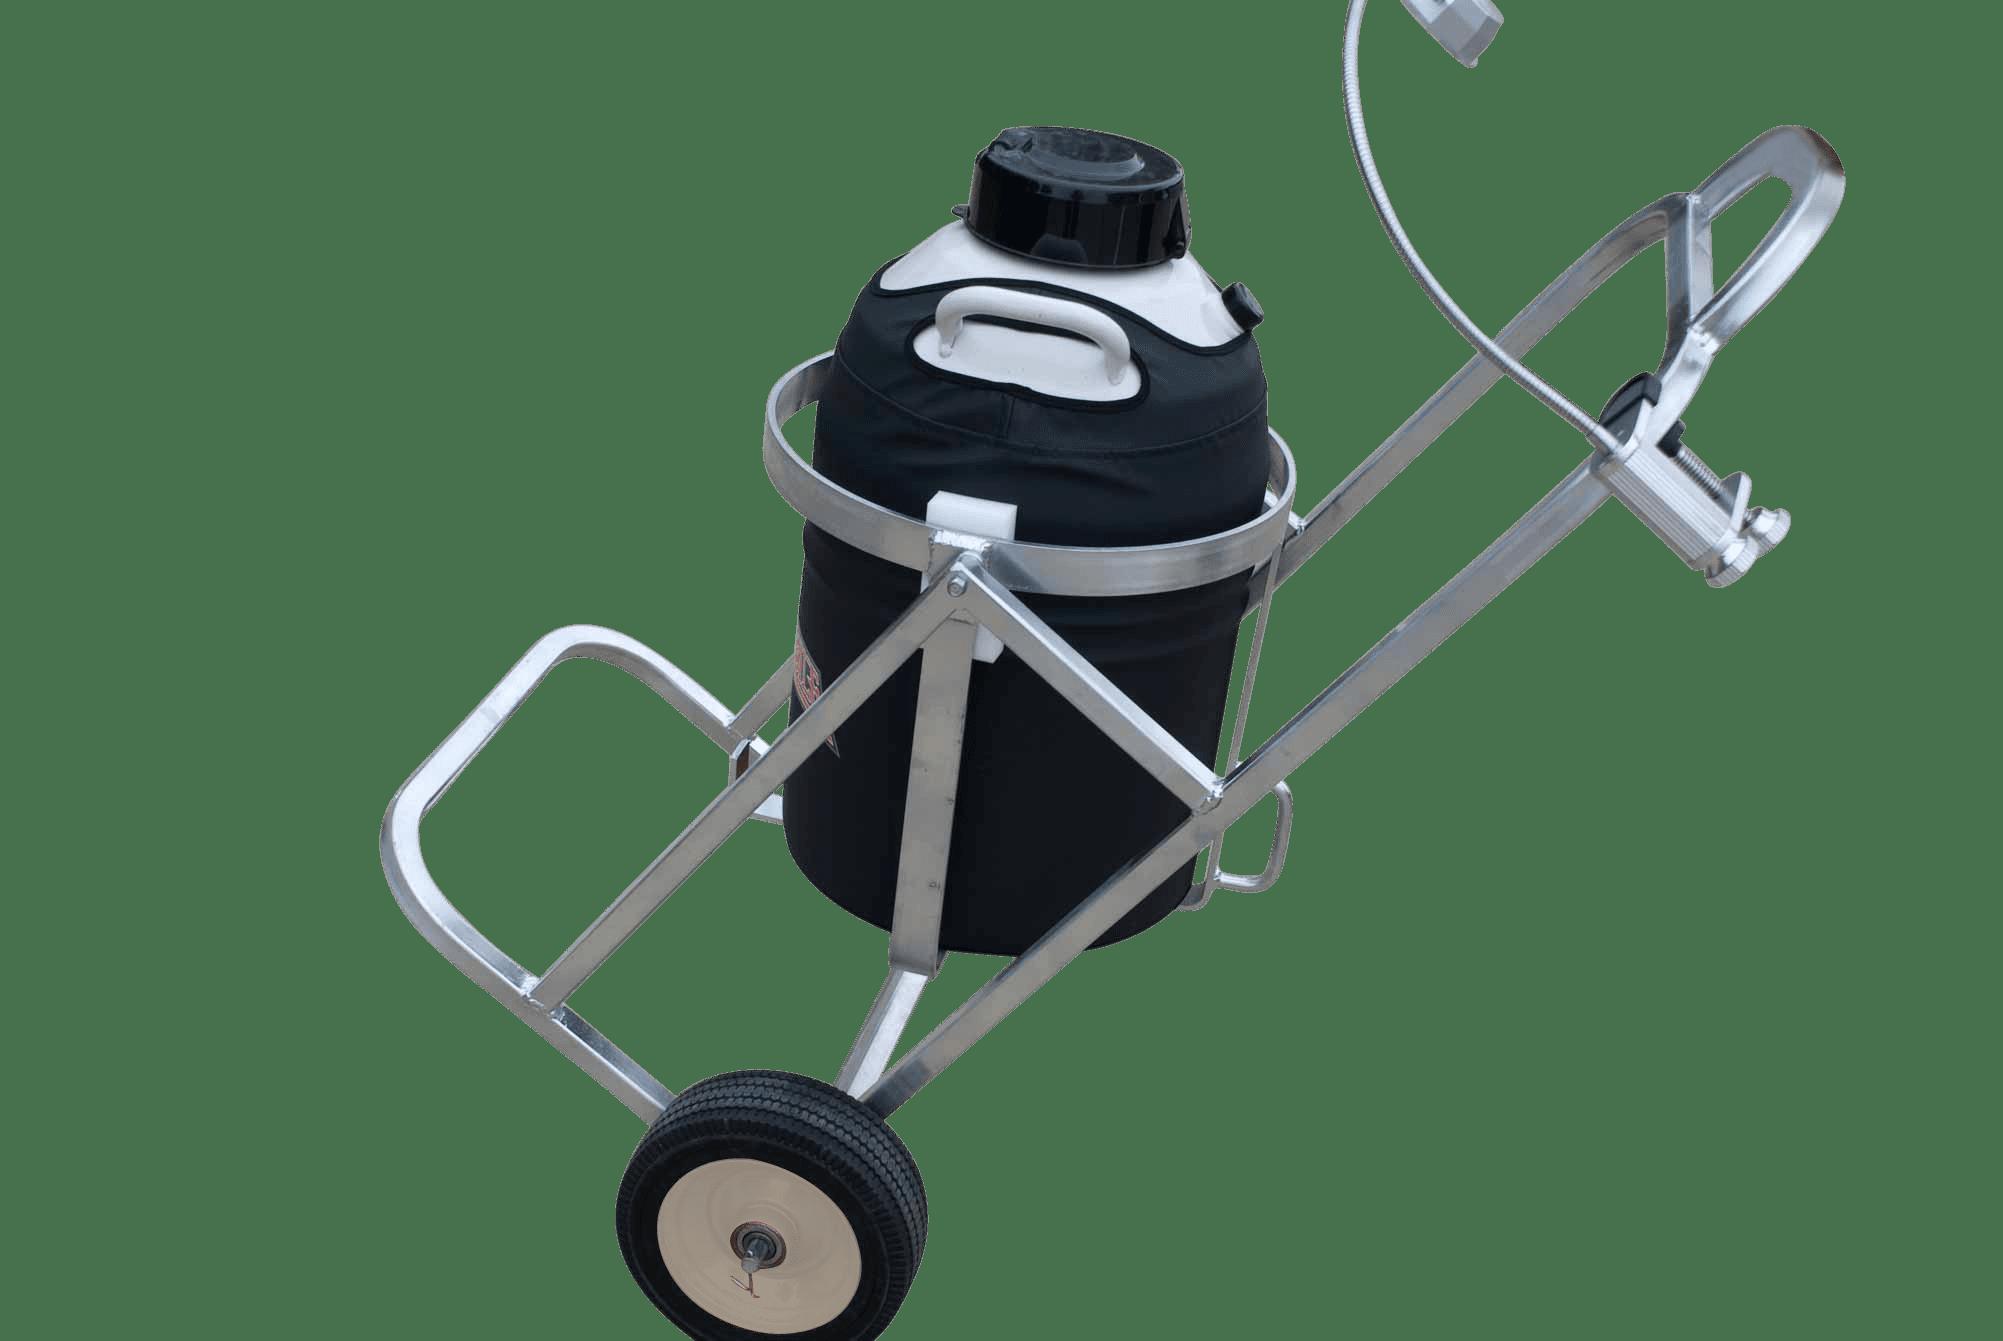 Tankmobile - New Item - Move your semen tanks/lab units easily